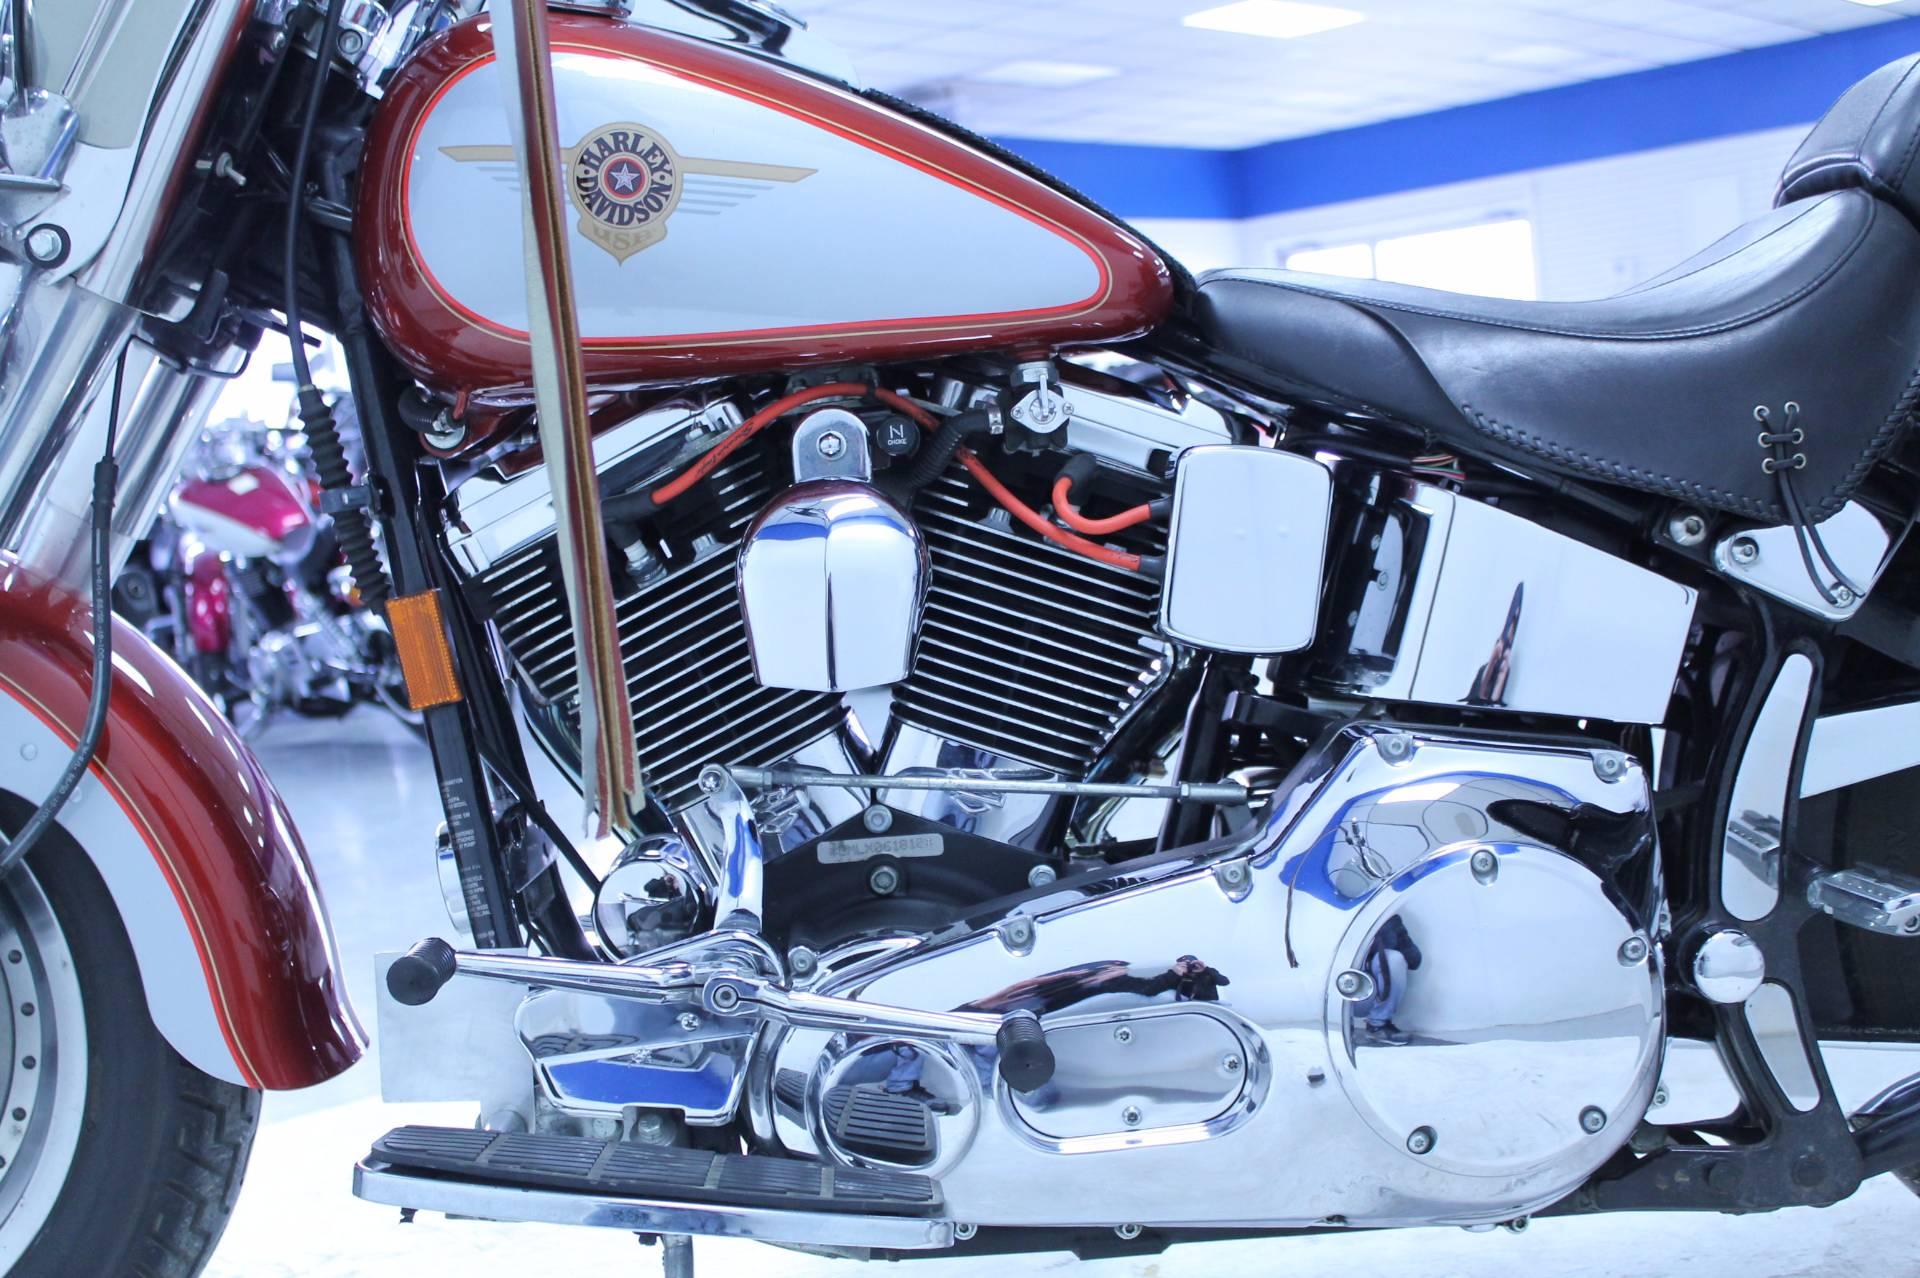 1999 Harley Davidson Flstf Fat Boy Motorcycles Adams Ma Massachusetts